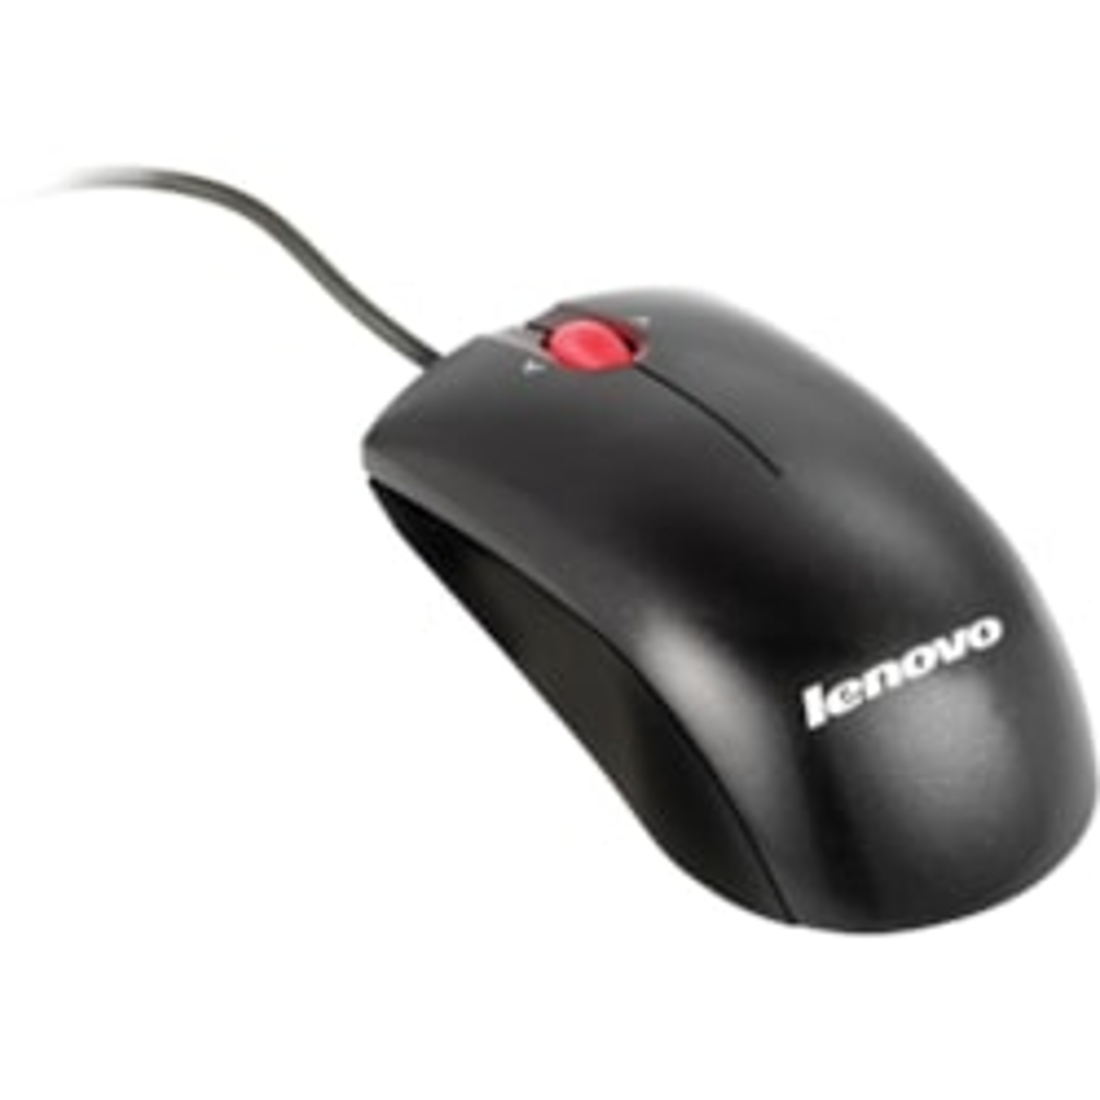 Lenovo 41U3074 Mouse - Laser - Cable